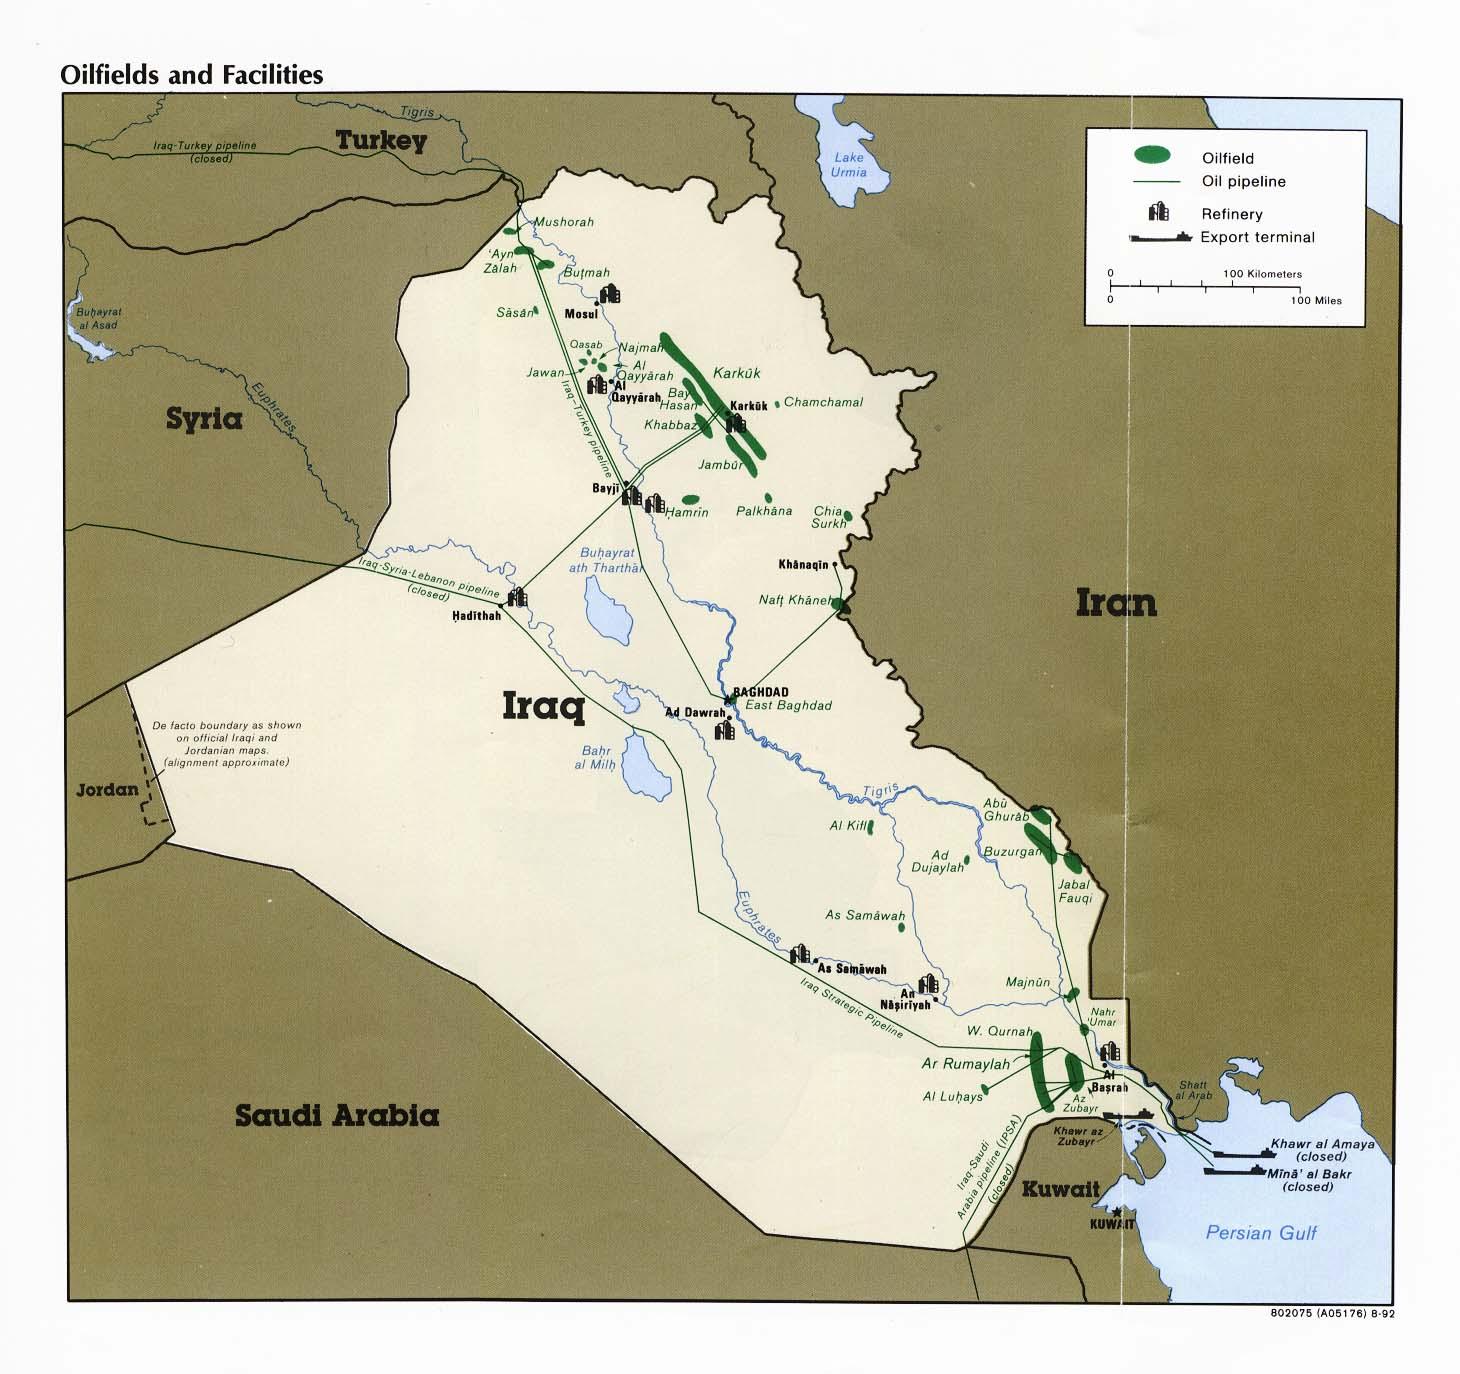 Map of Iraq (Map of Oil Fields) : Weltkarte.com - Karten und ...